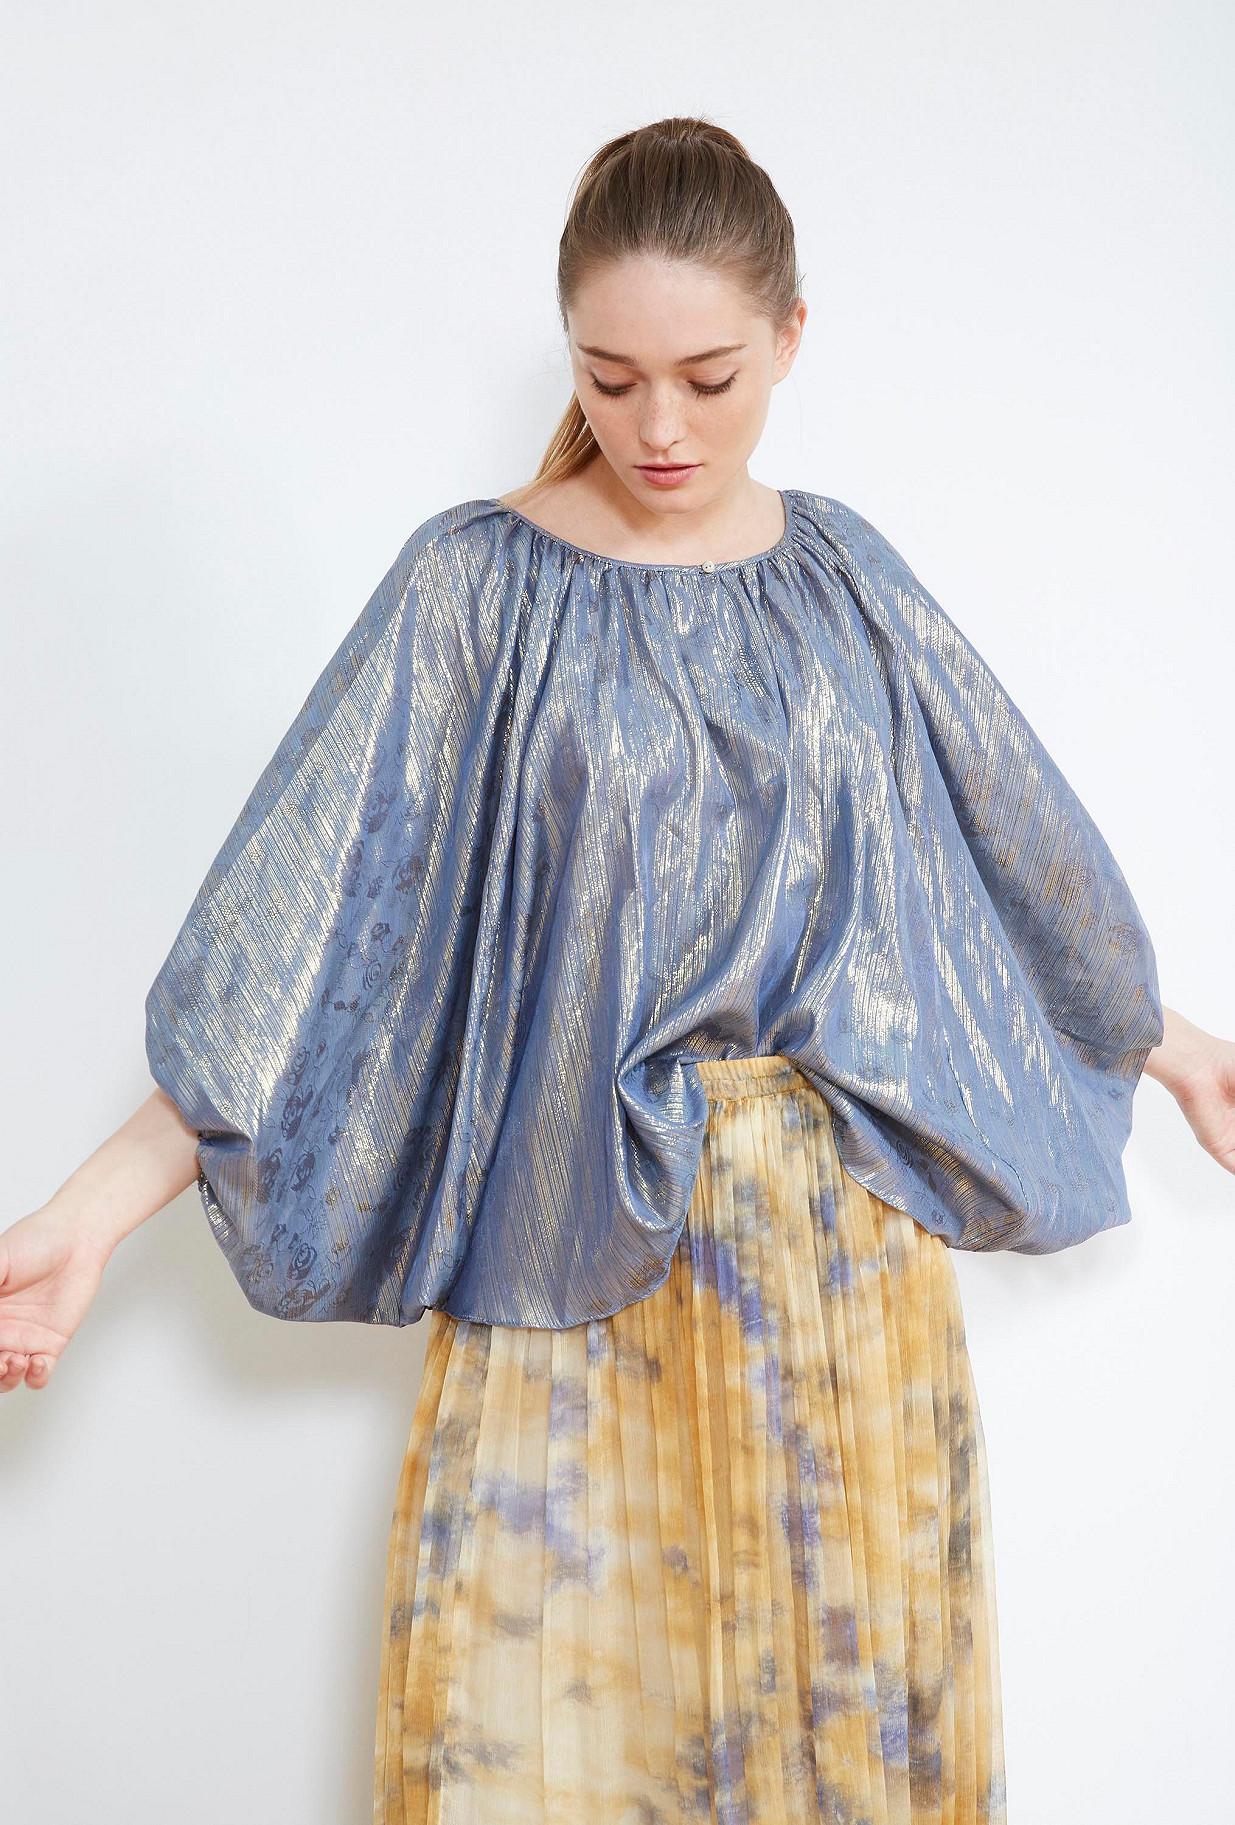 clothes store PONCHO  Corfou french designer fashion Paris